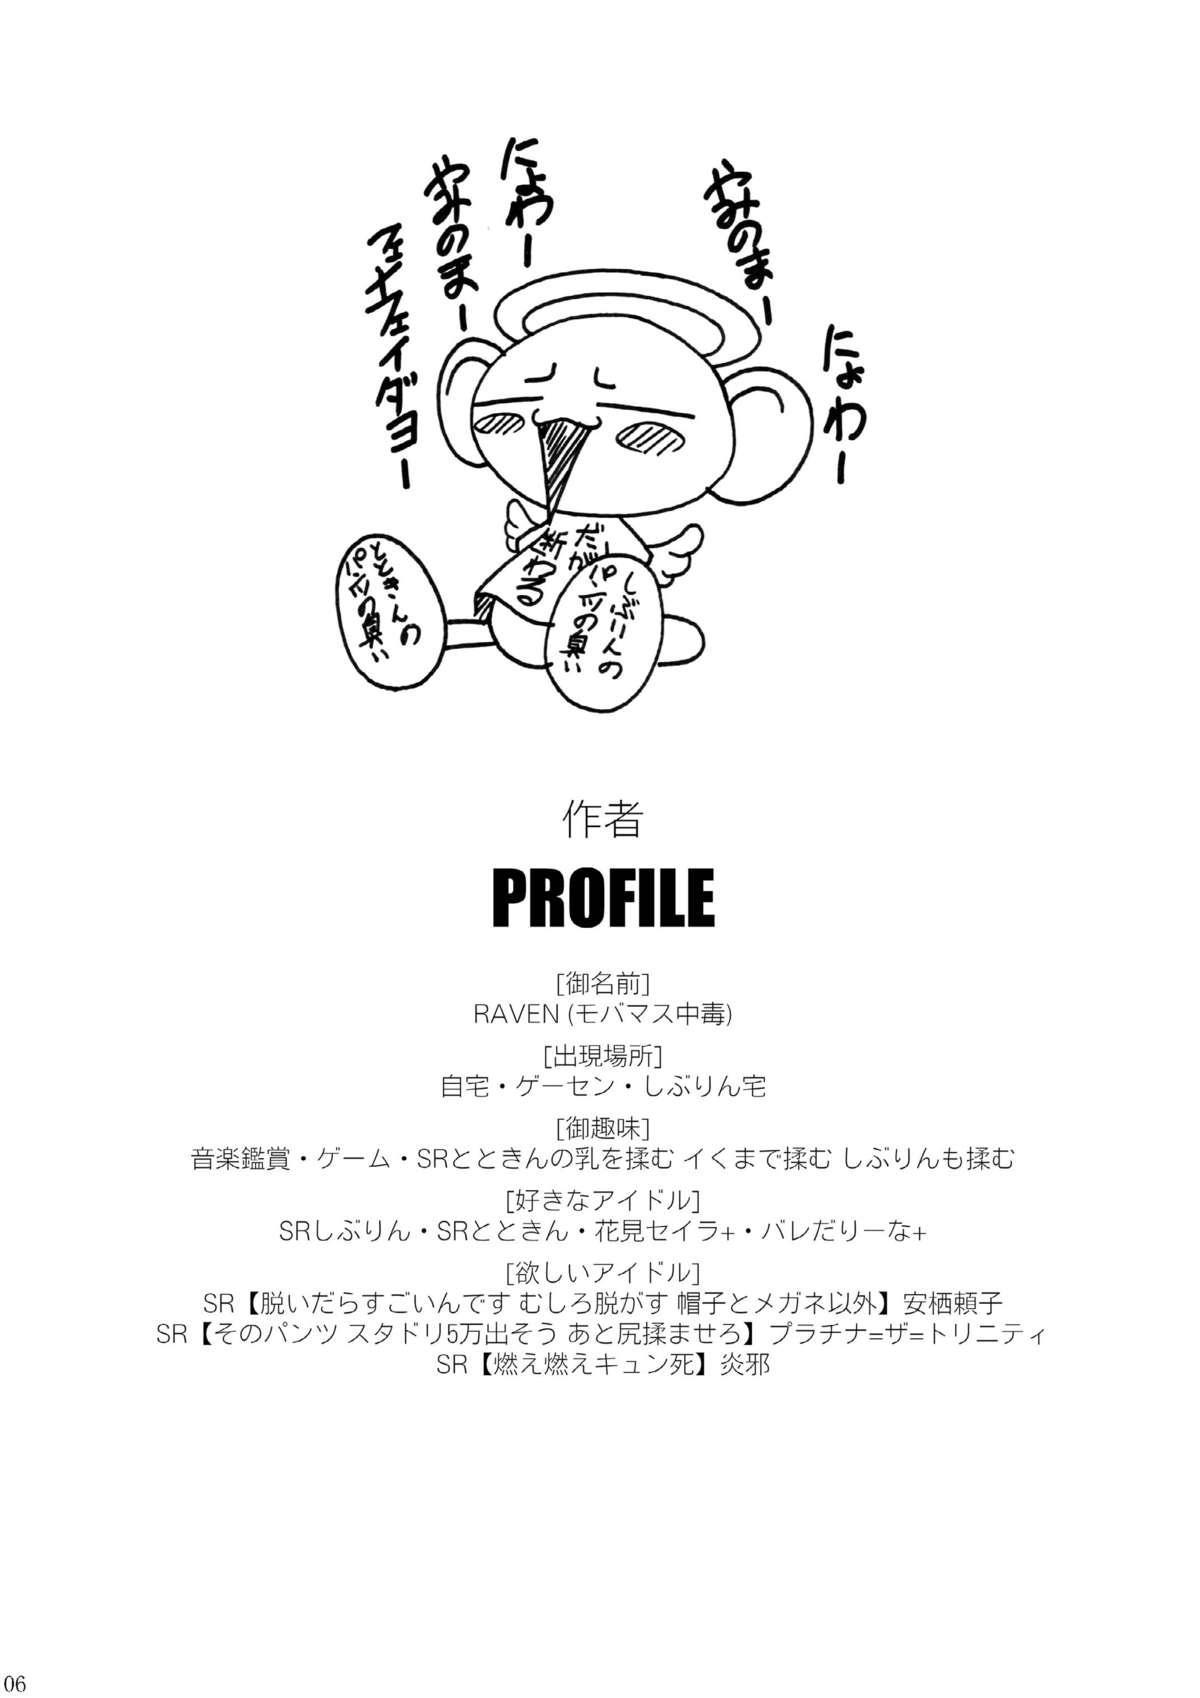 Ran ☆ Bato - Round 2 5